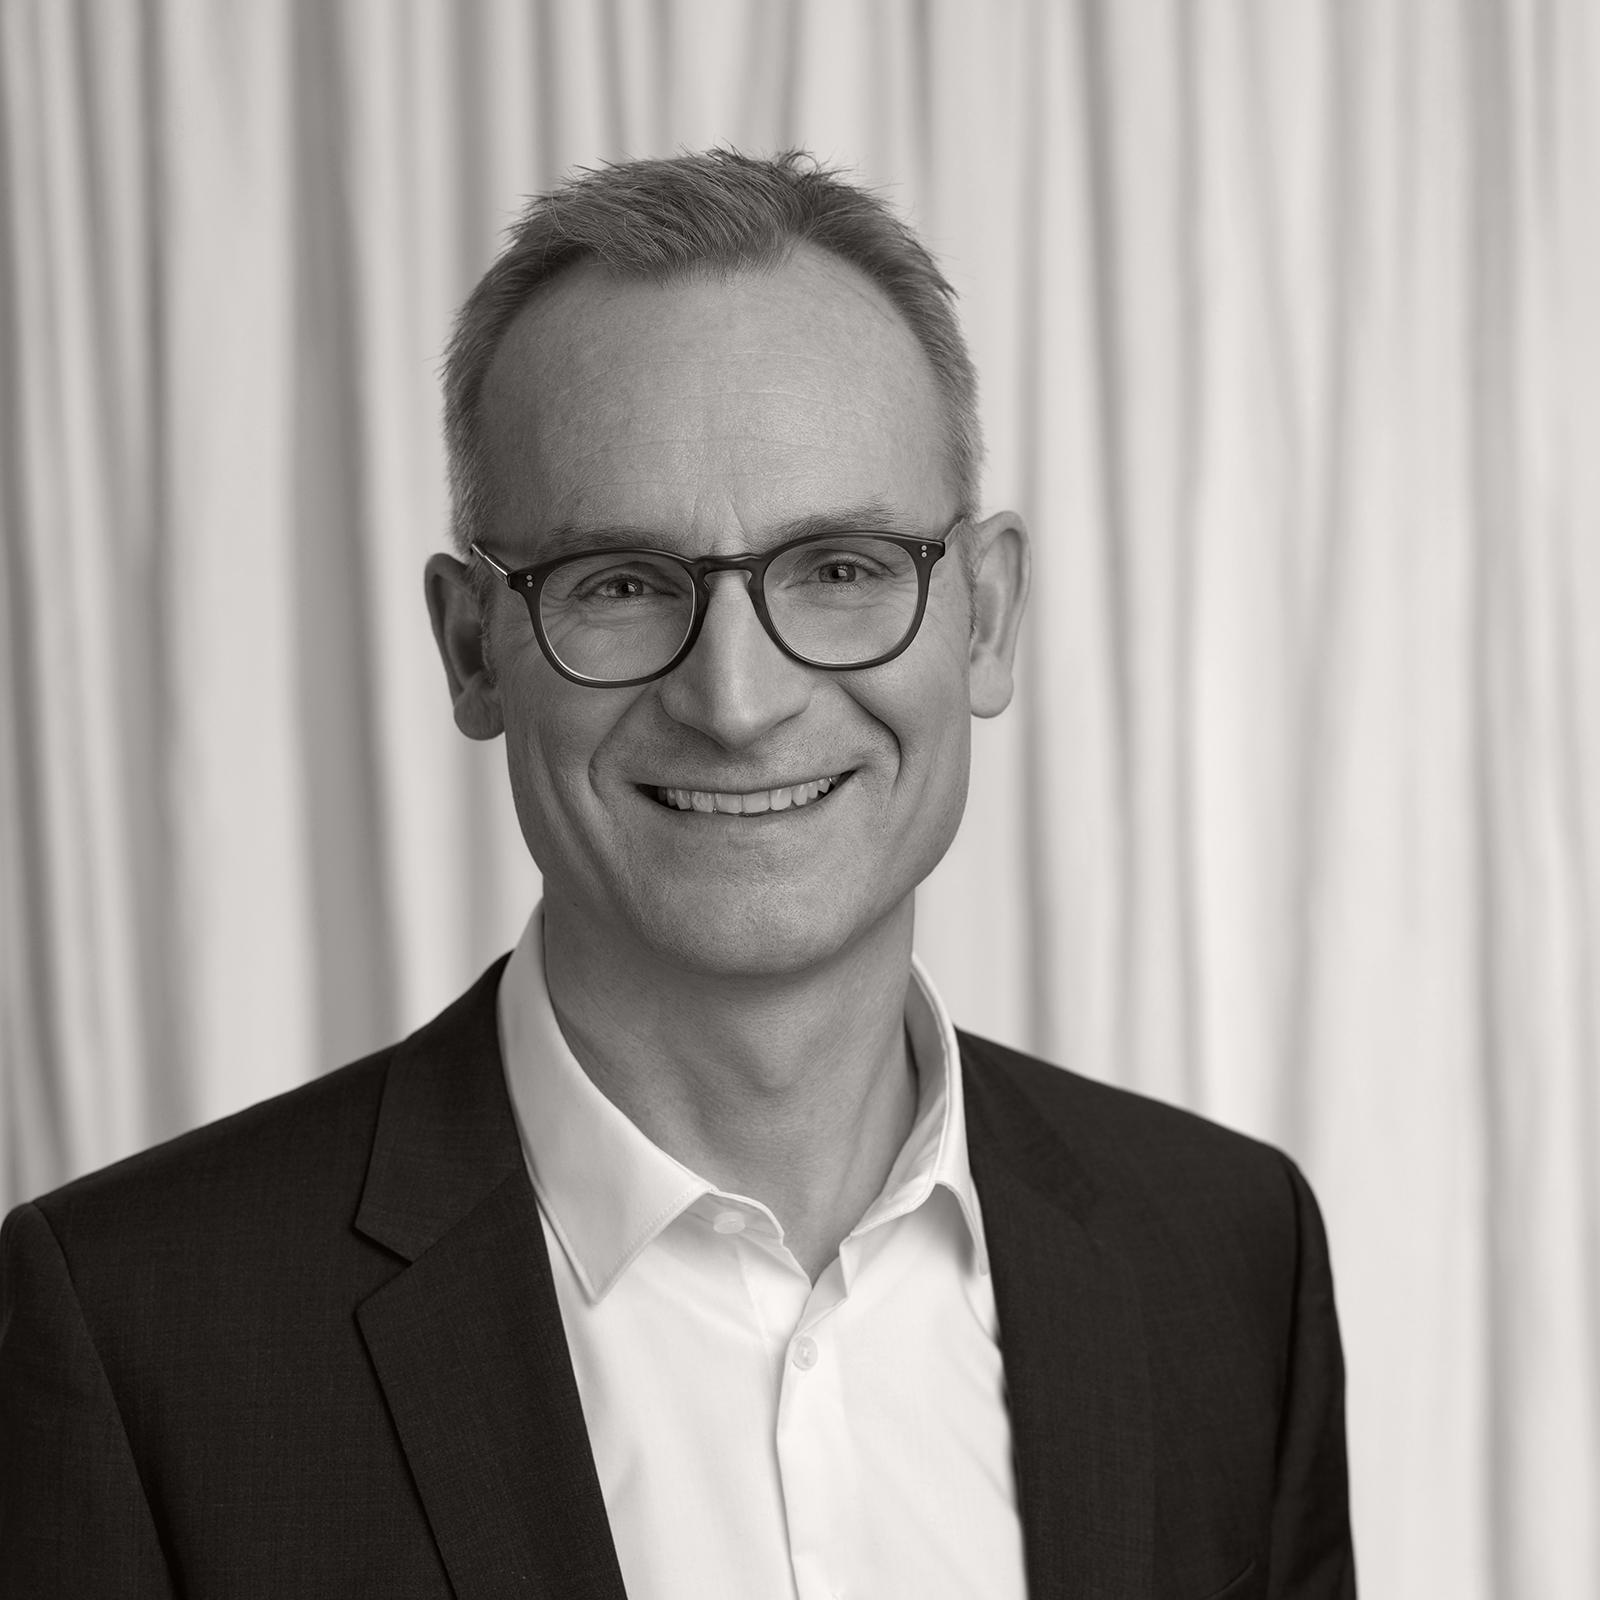 Harald Goertz